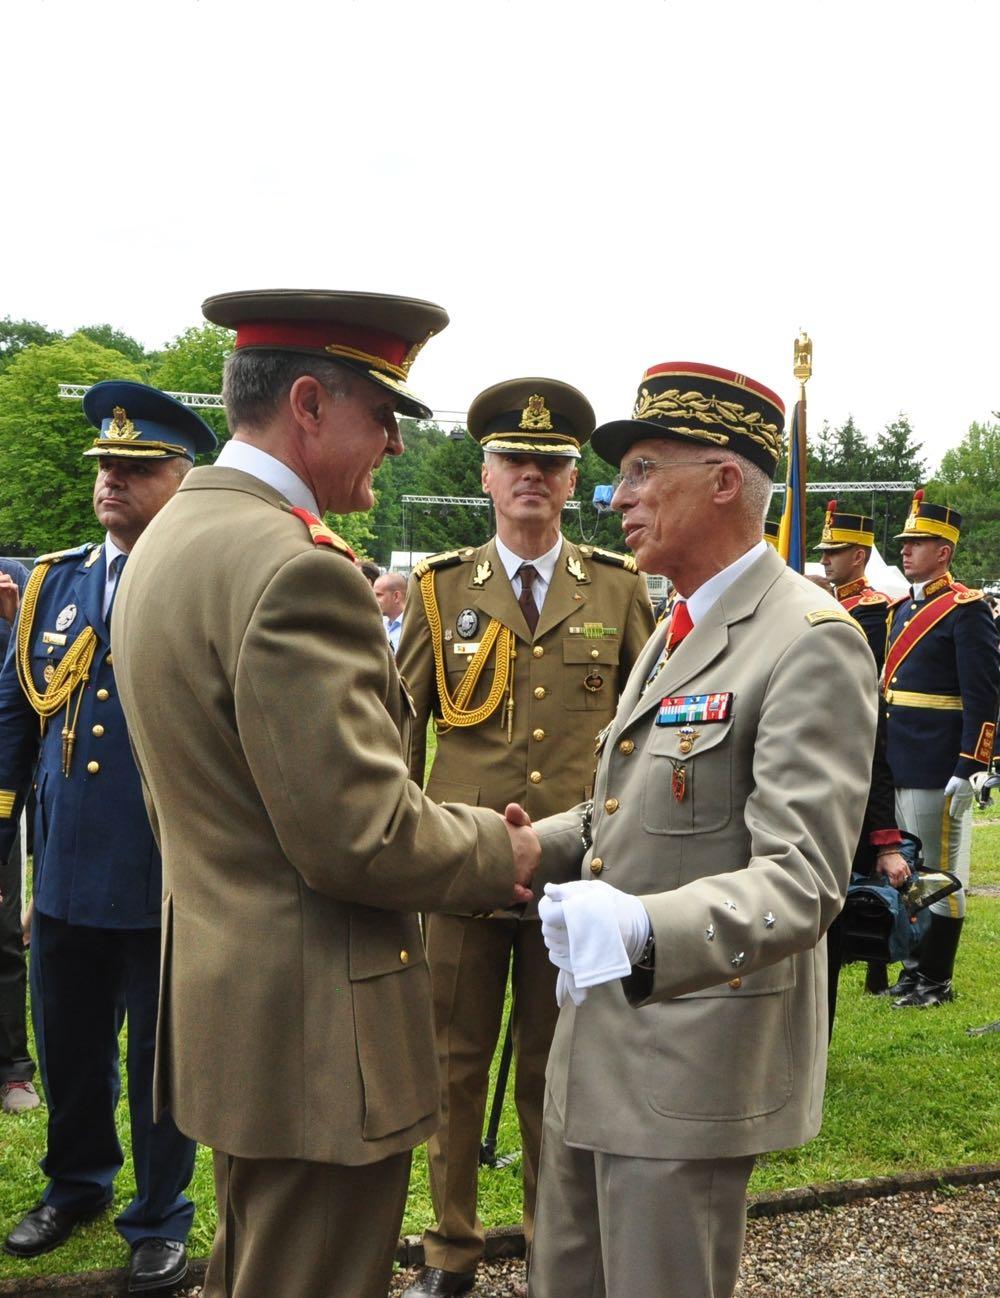 Ceremonie de omagiere a soldatilor romani ingropati la Soultzmatt in Primul Razboi Mondial, Principele Radu, 3 iunie 2017